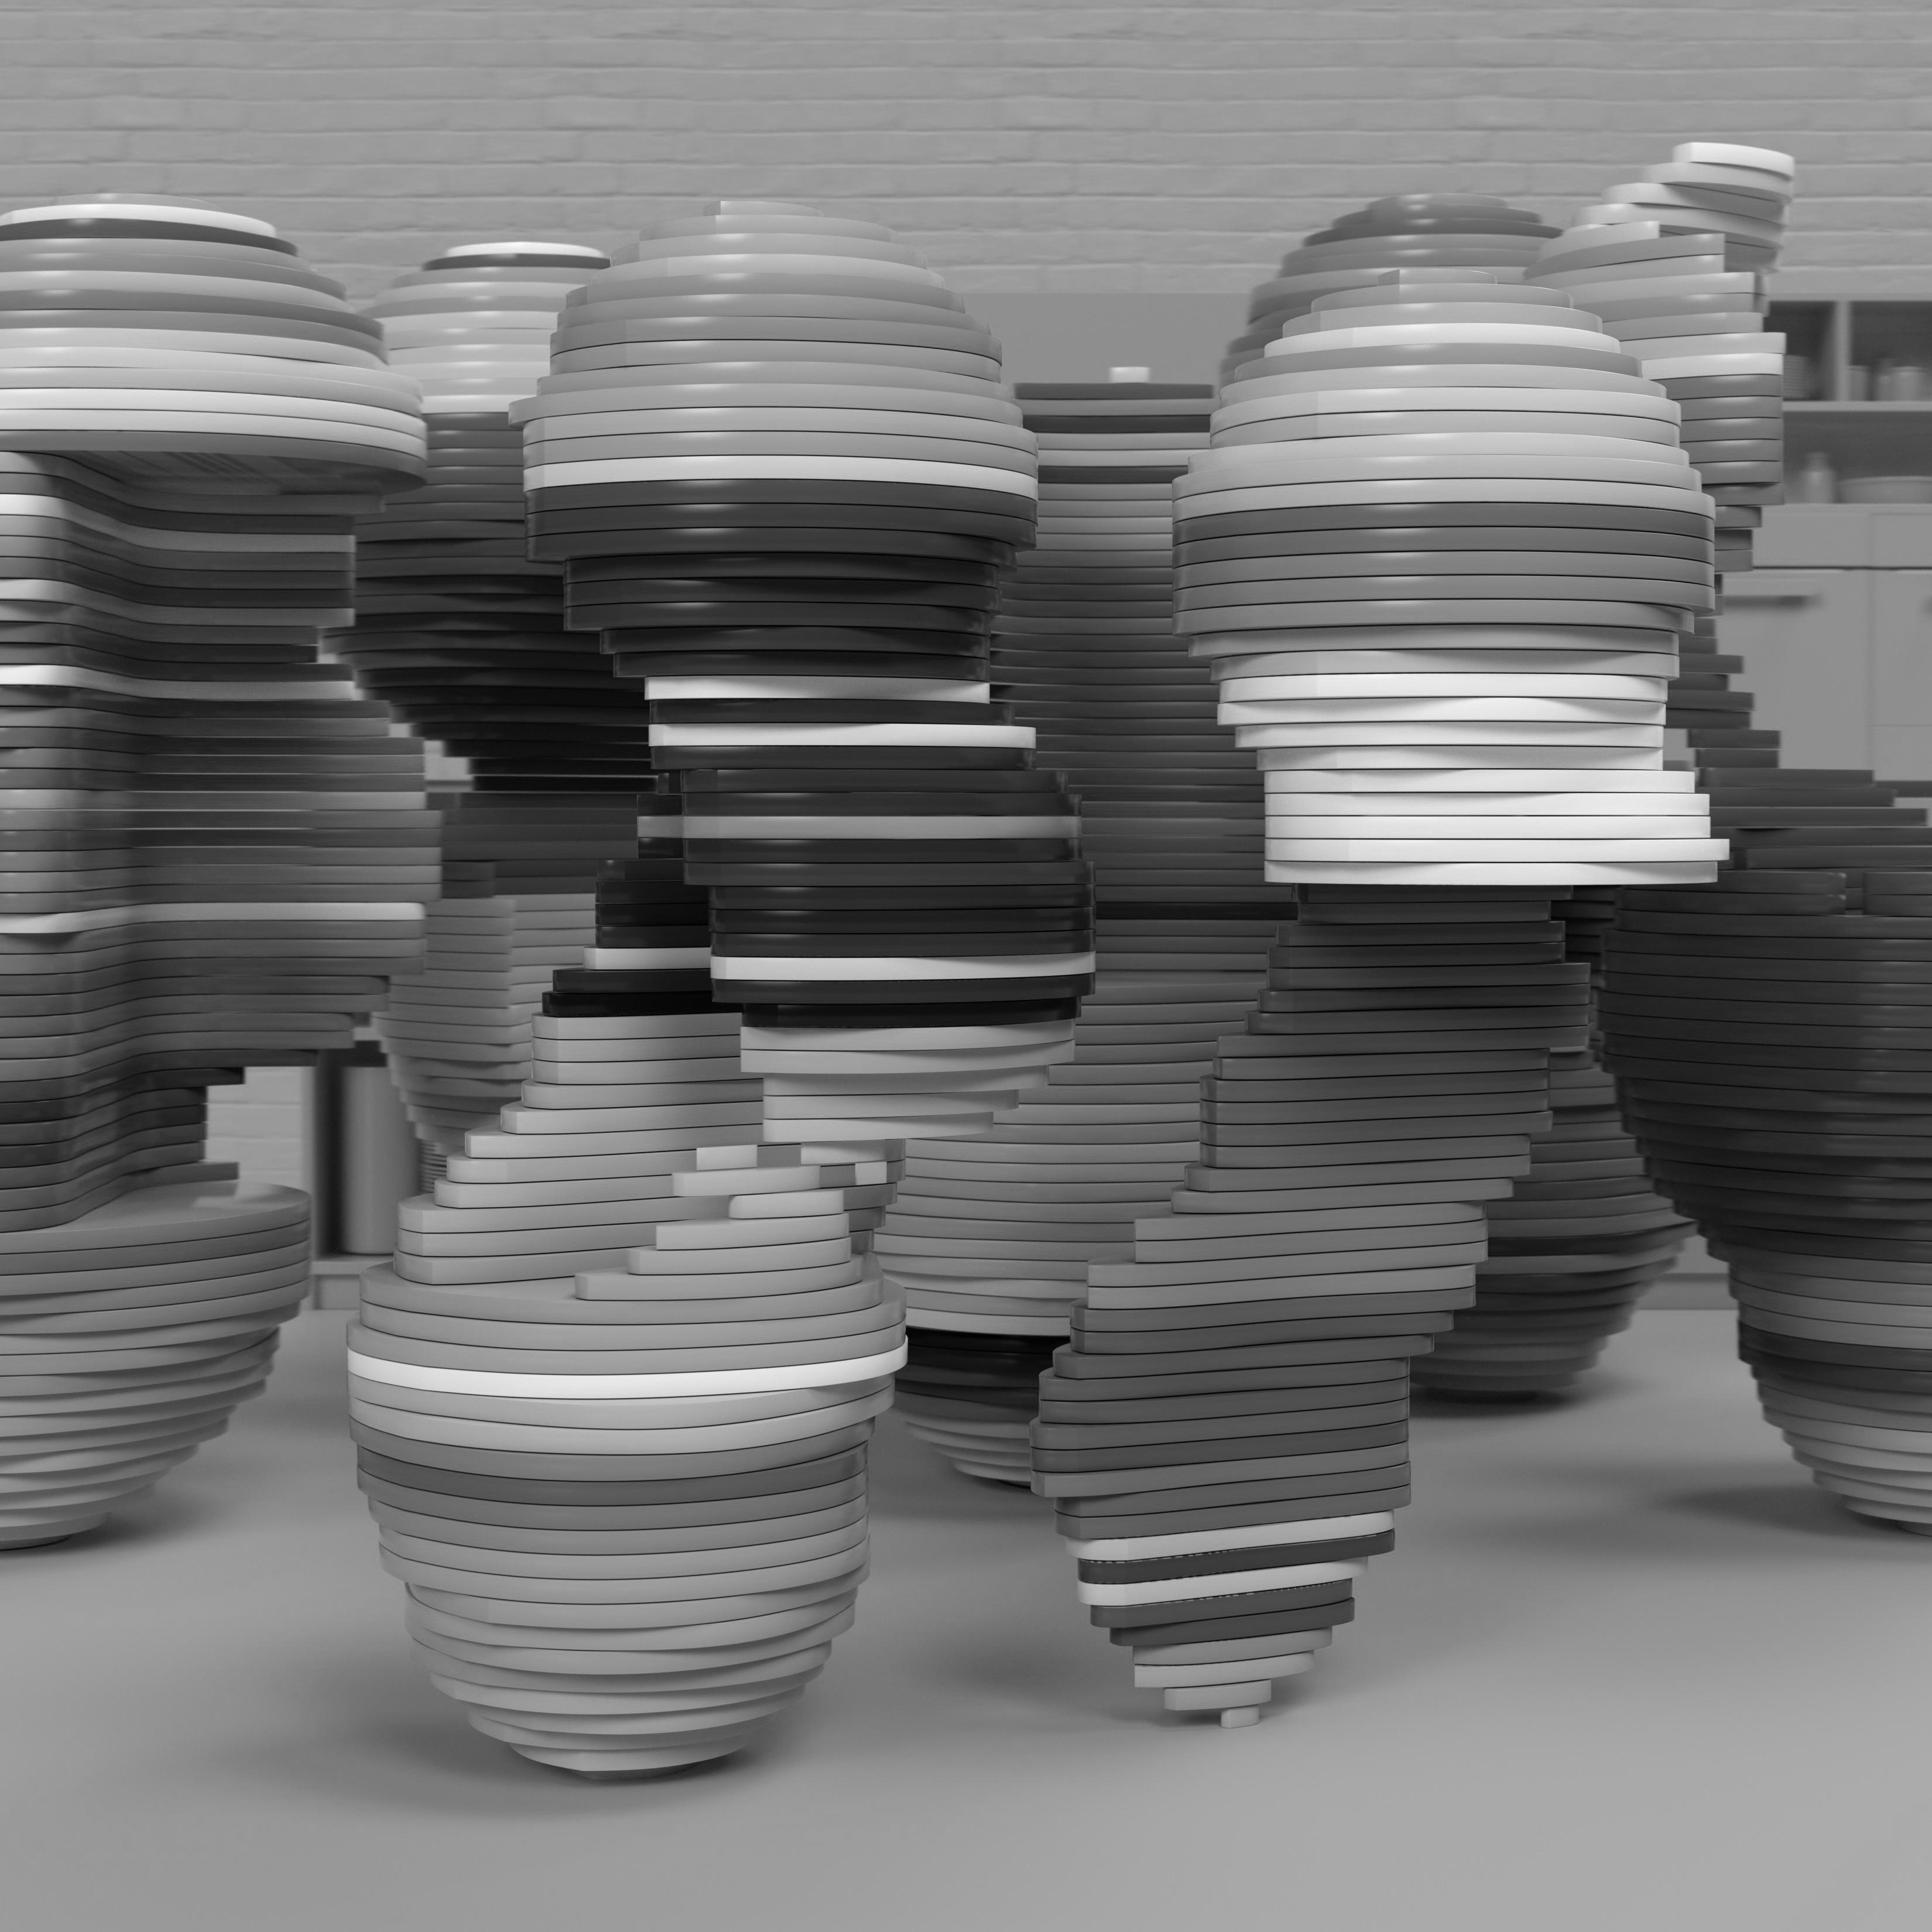 Zeit_User Pic_Square-black&white